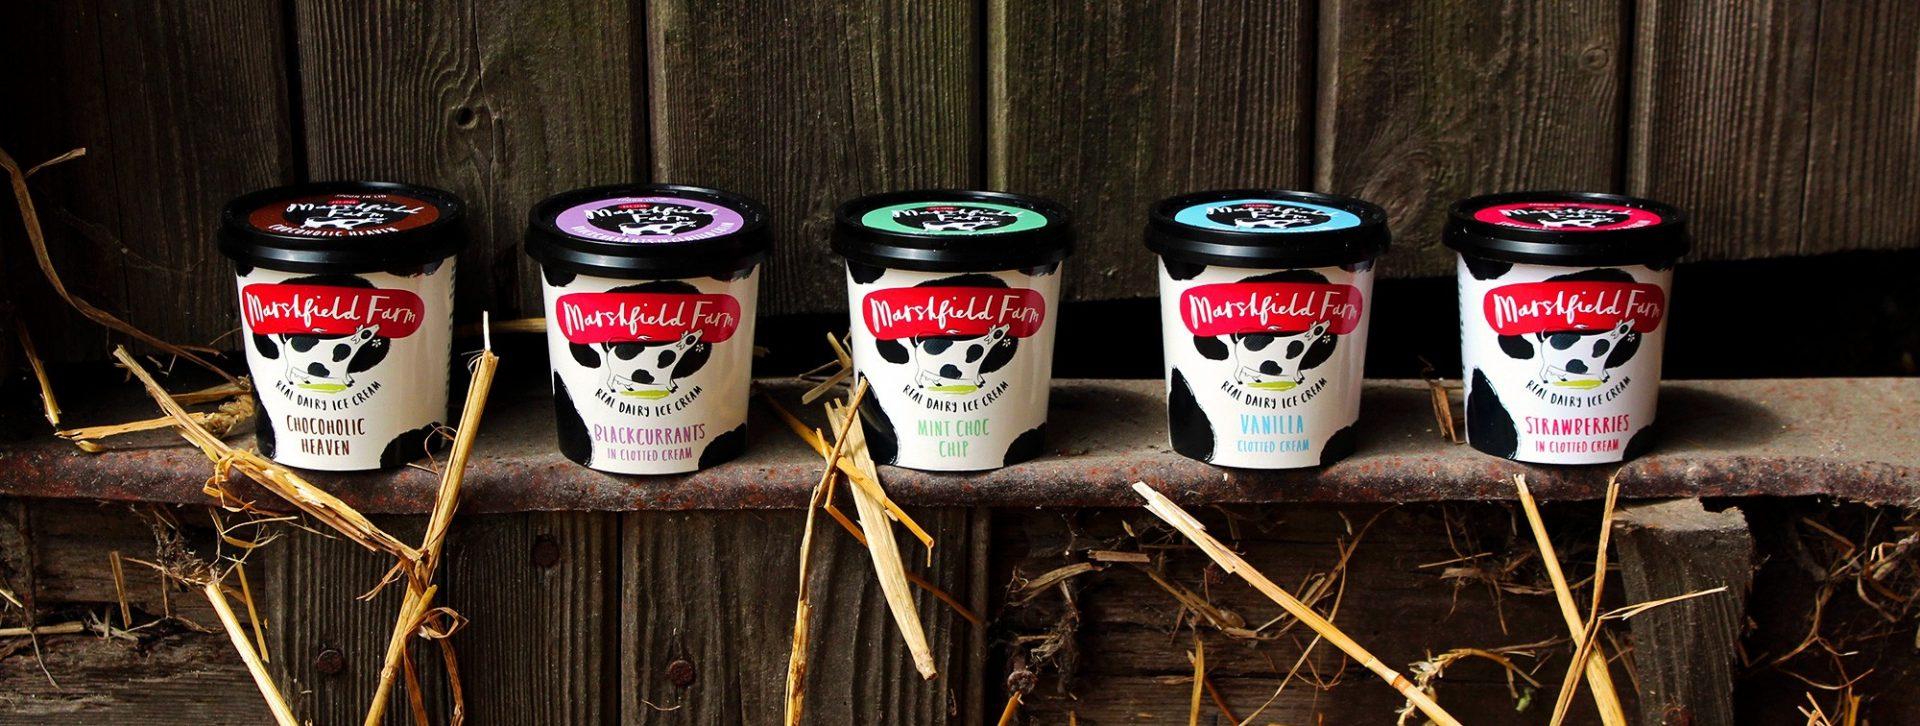 Pre-purchase Ice Cream Vouchers